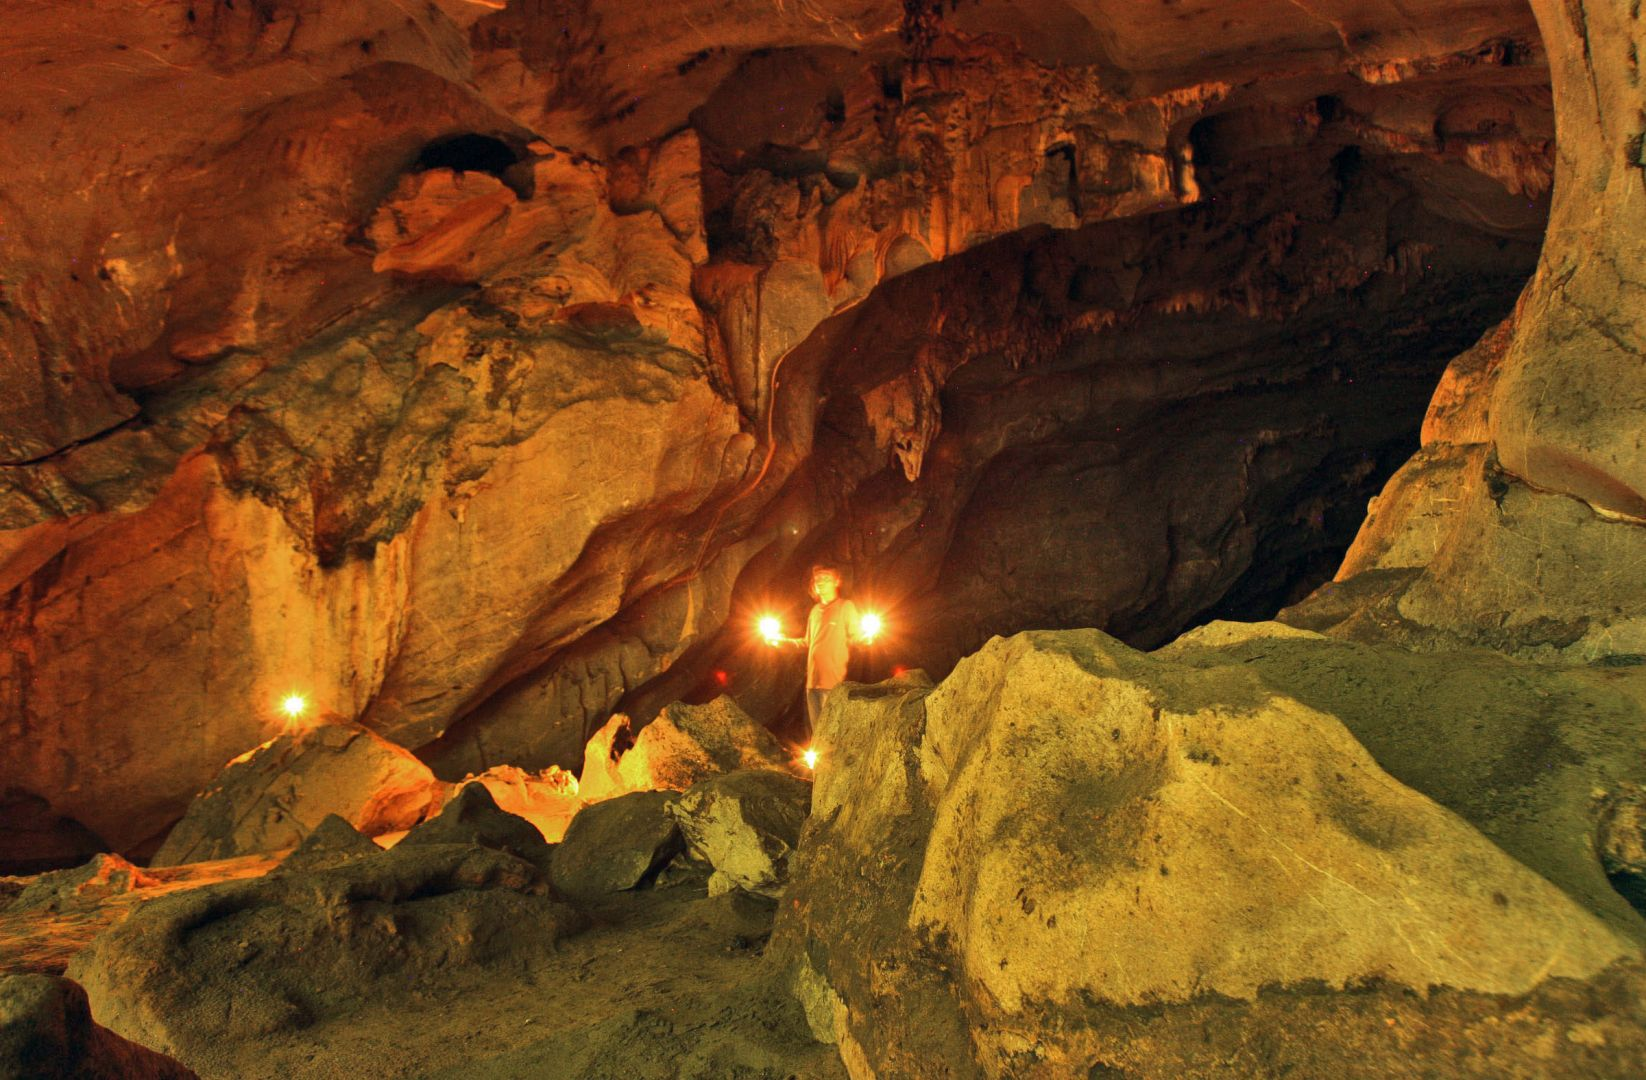 Indonesian Cave Reveals Tsunami History